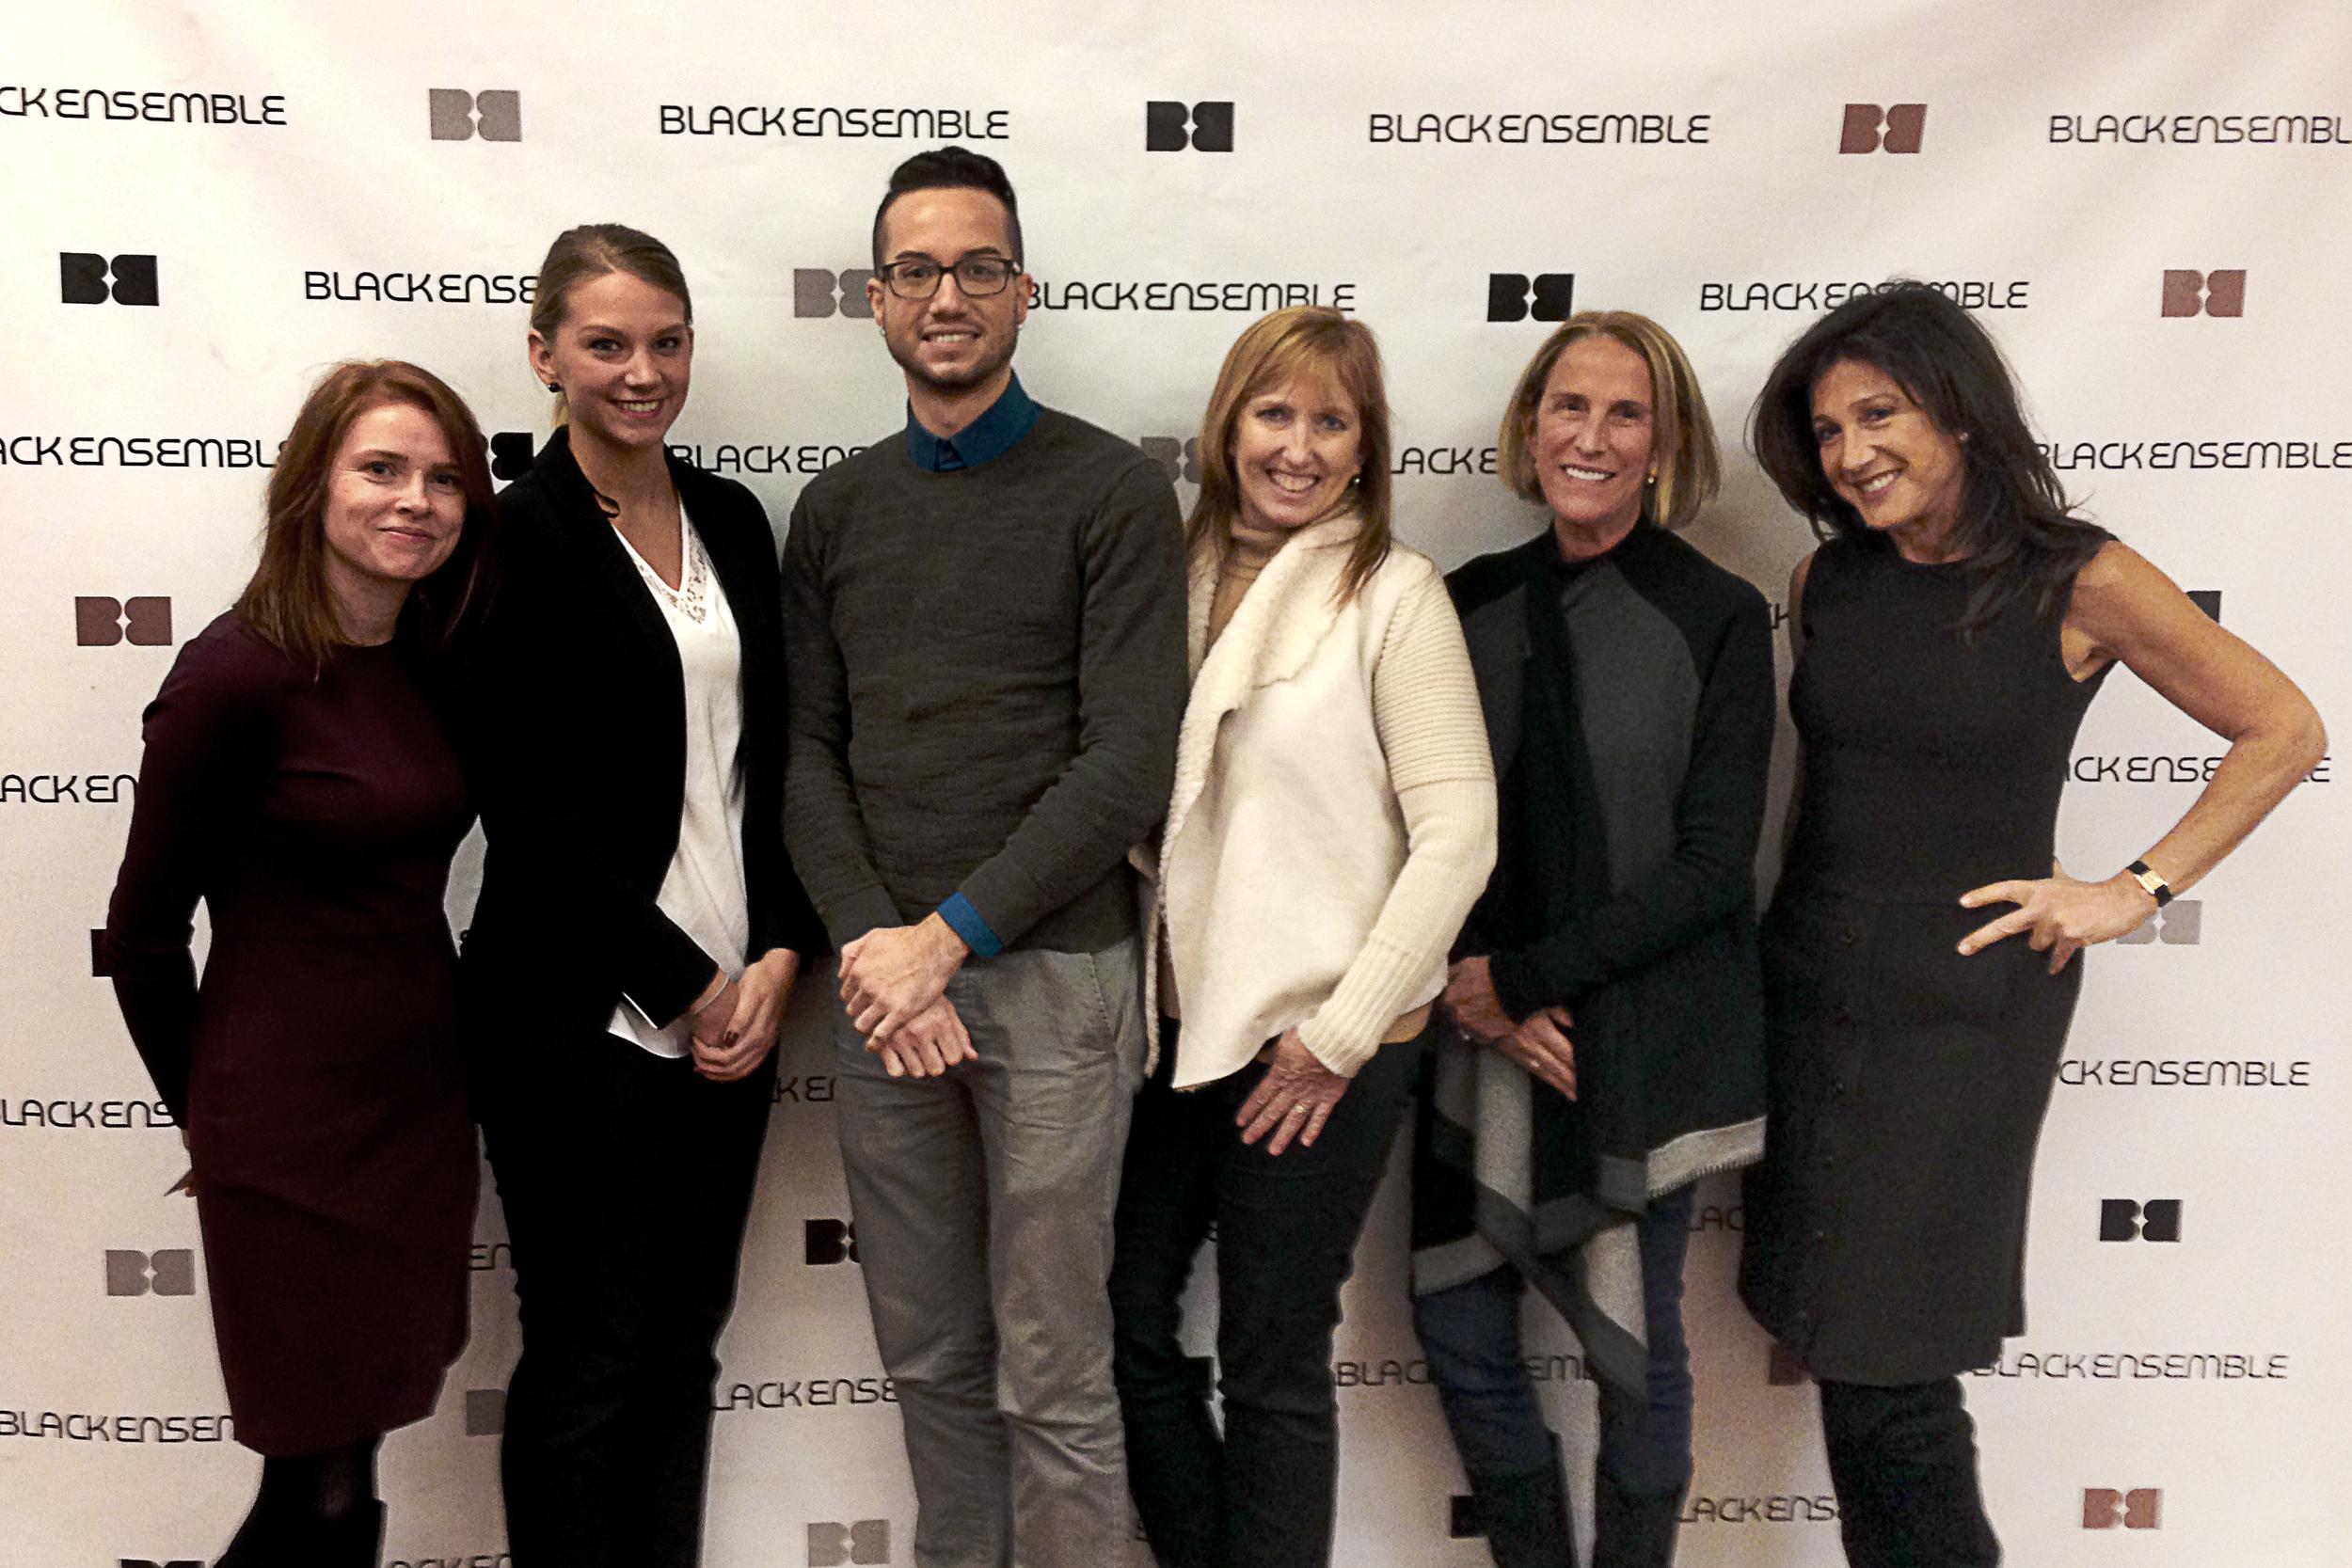 From left: Inga Dainius, Victoria Young, Nic Gabriel, Debra Justice, Leslie Jones and Marlene Iglitzen